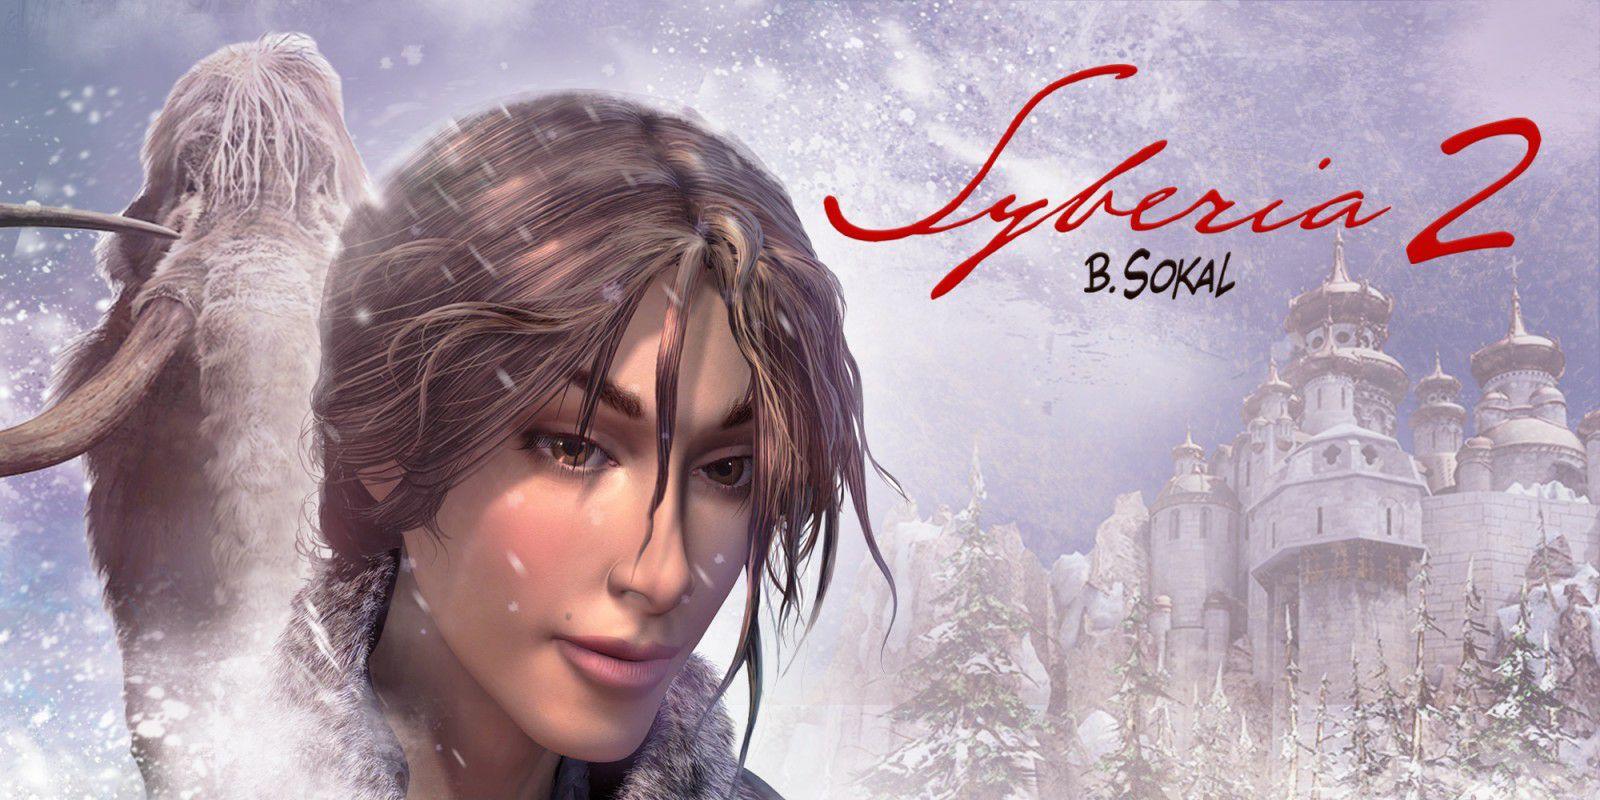 Syberia 2 (Nintendo Switch) £1.34 @ Nintendo eShop